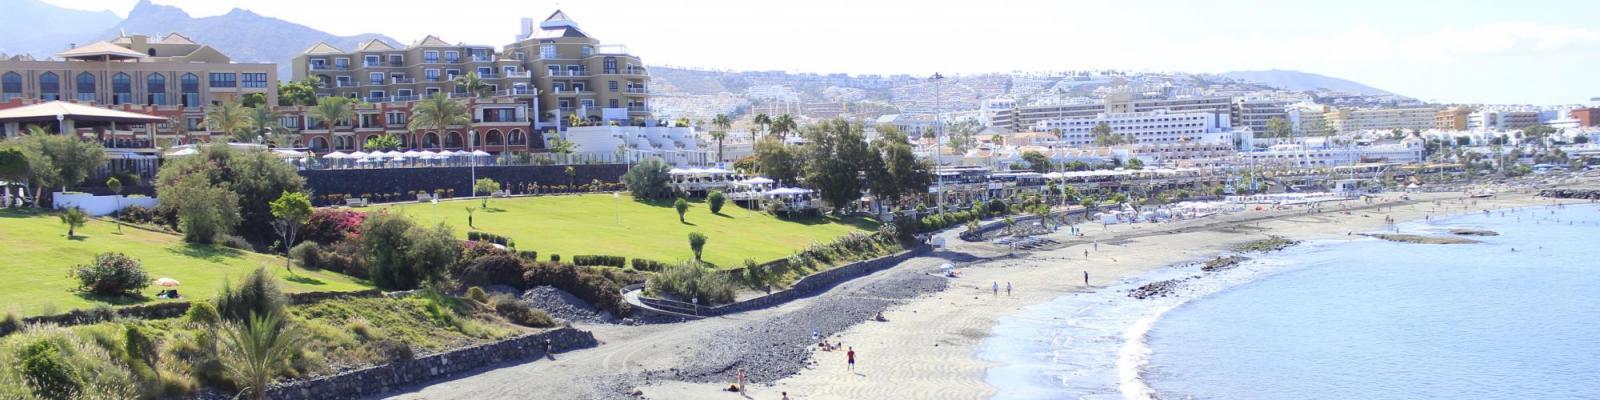 Aparthotel Panoràmica - Costa Adeje, Tenerife